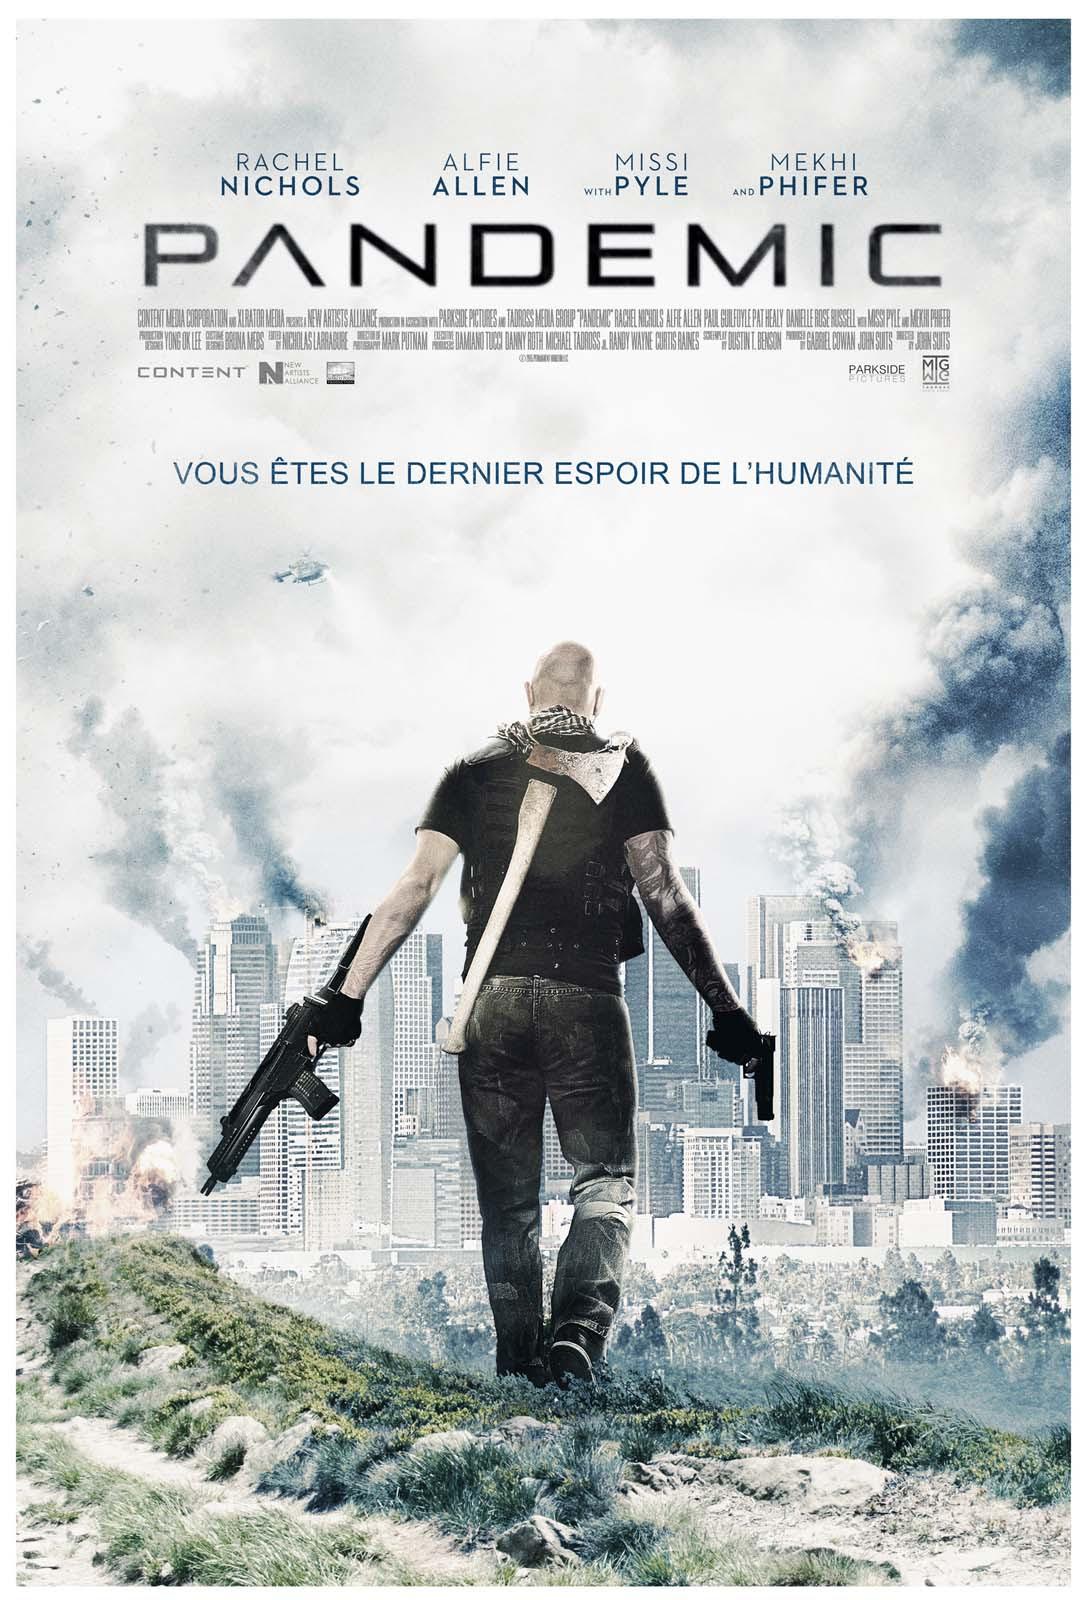 Pandemie Film 2011